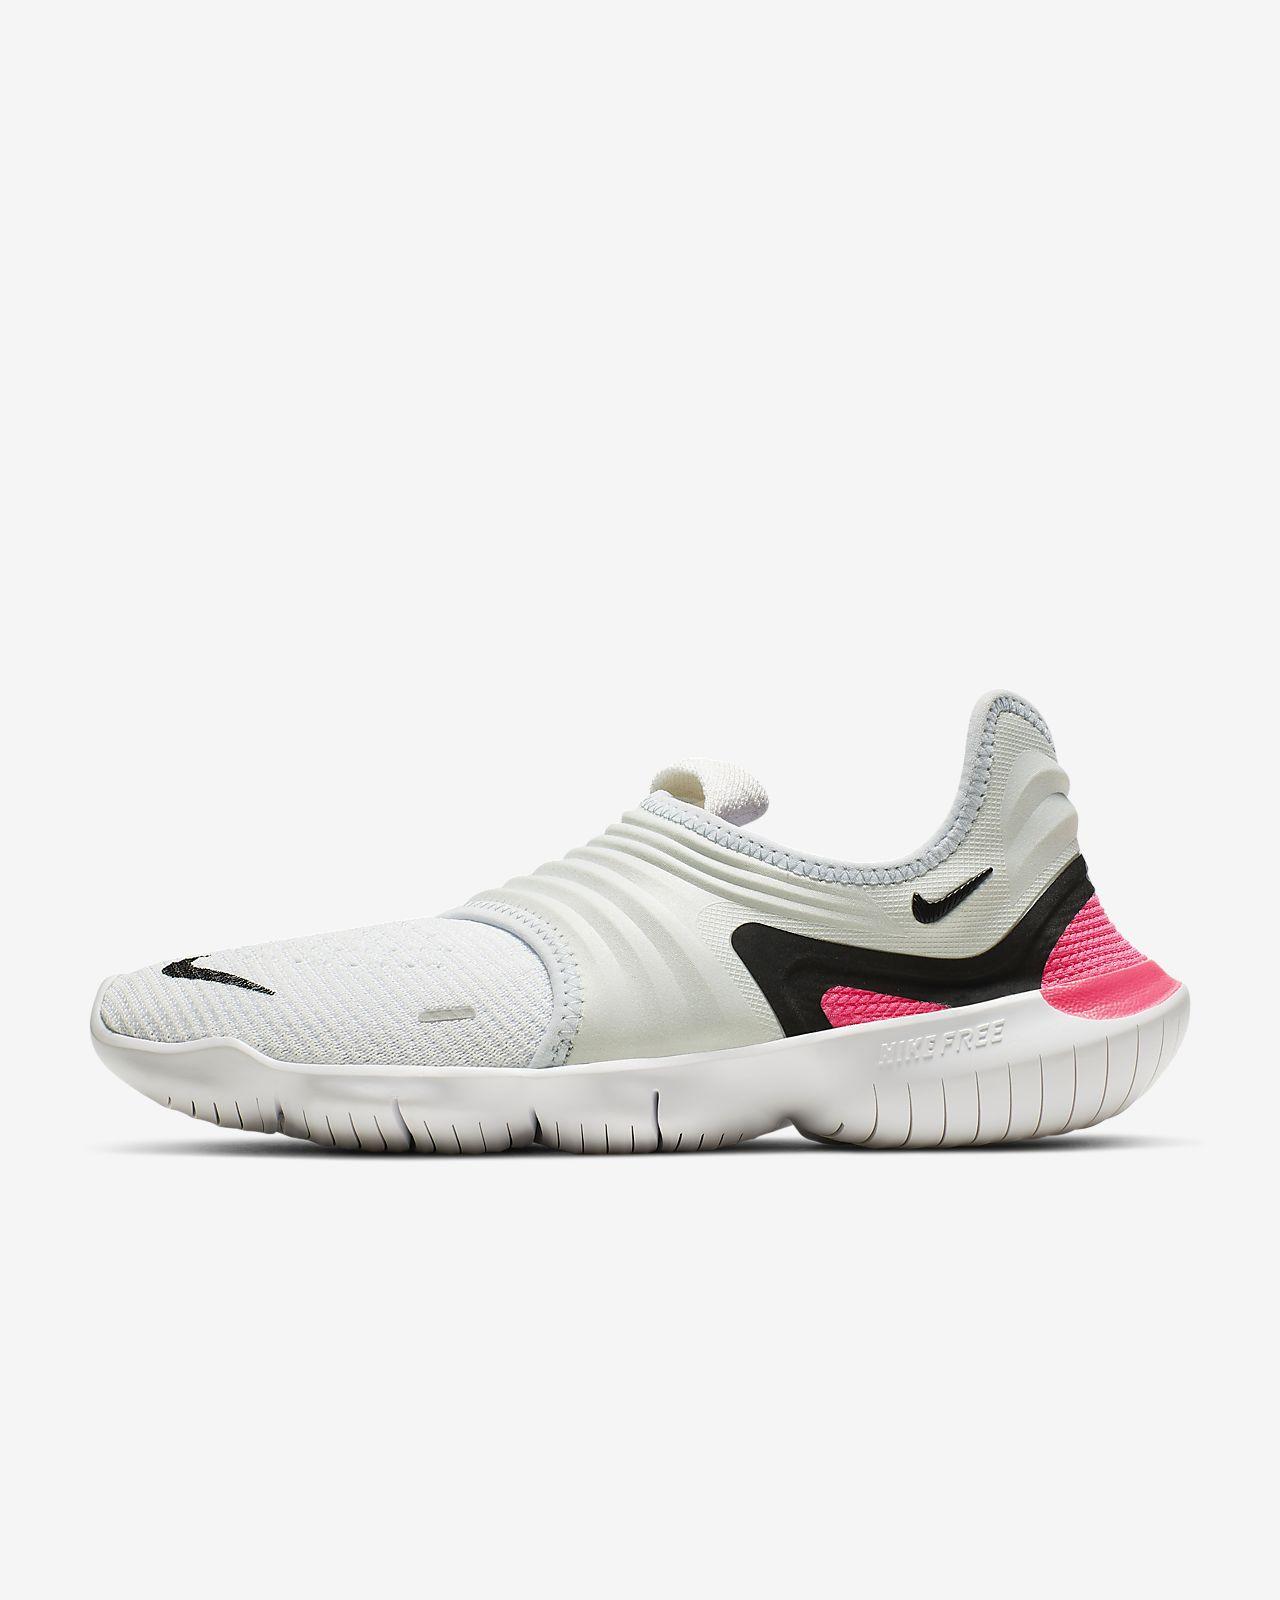 the best attitude 63075 e20b4 ... Chaussure de running Nike Free RN Flyknit 3.0 pour Femme